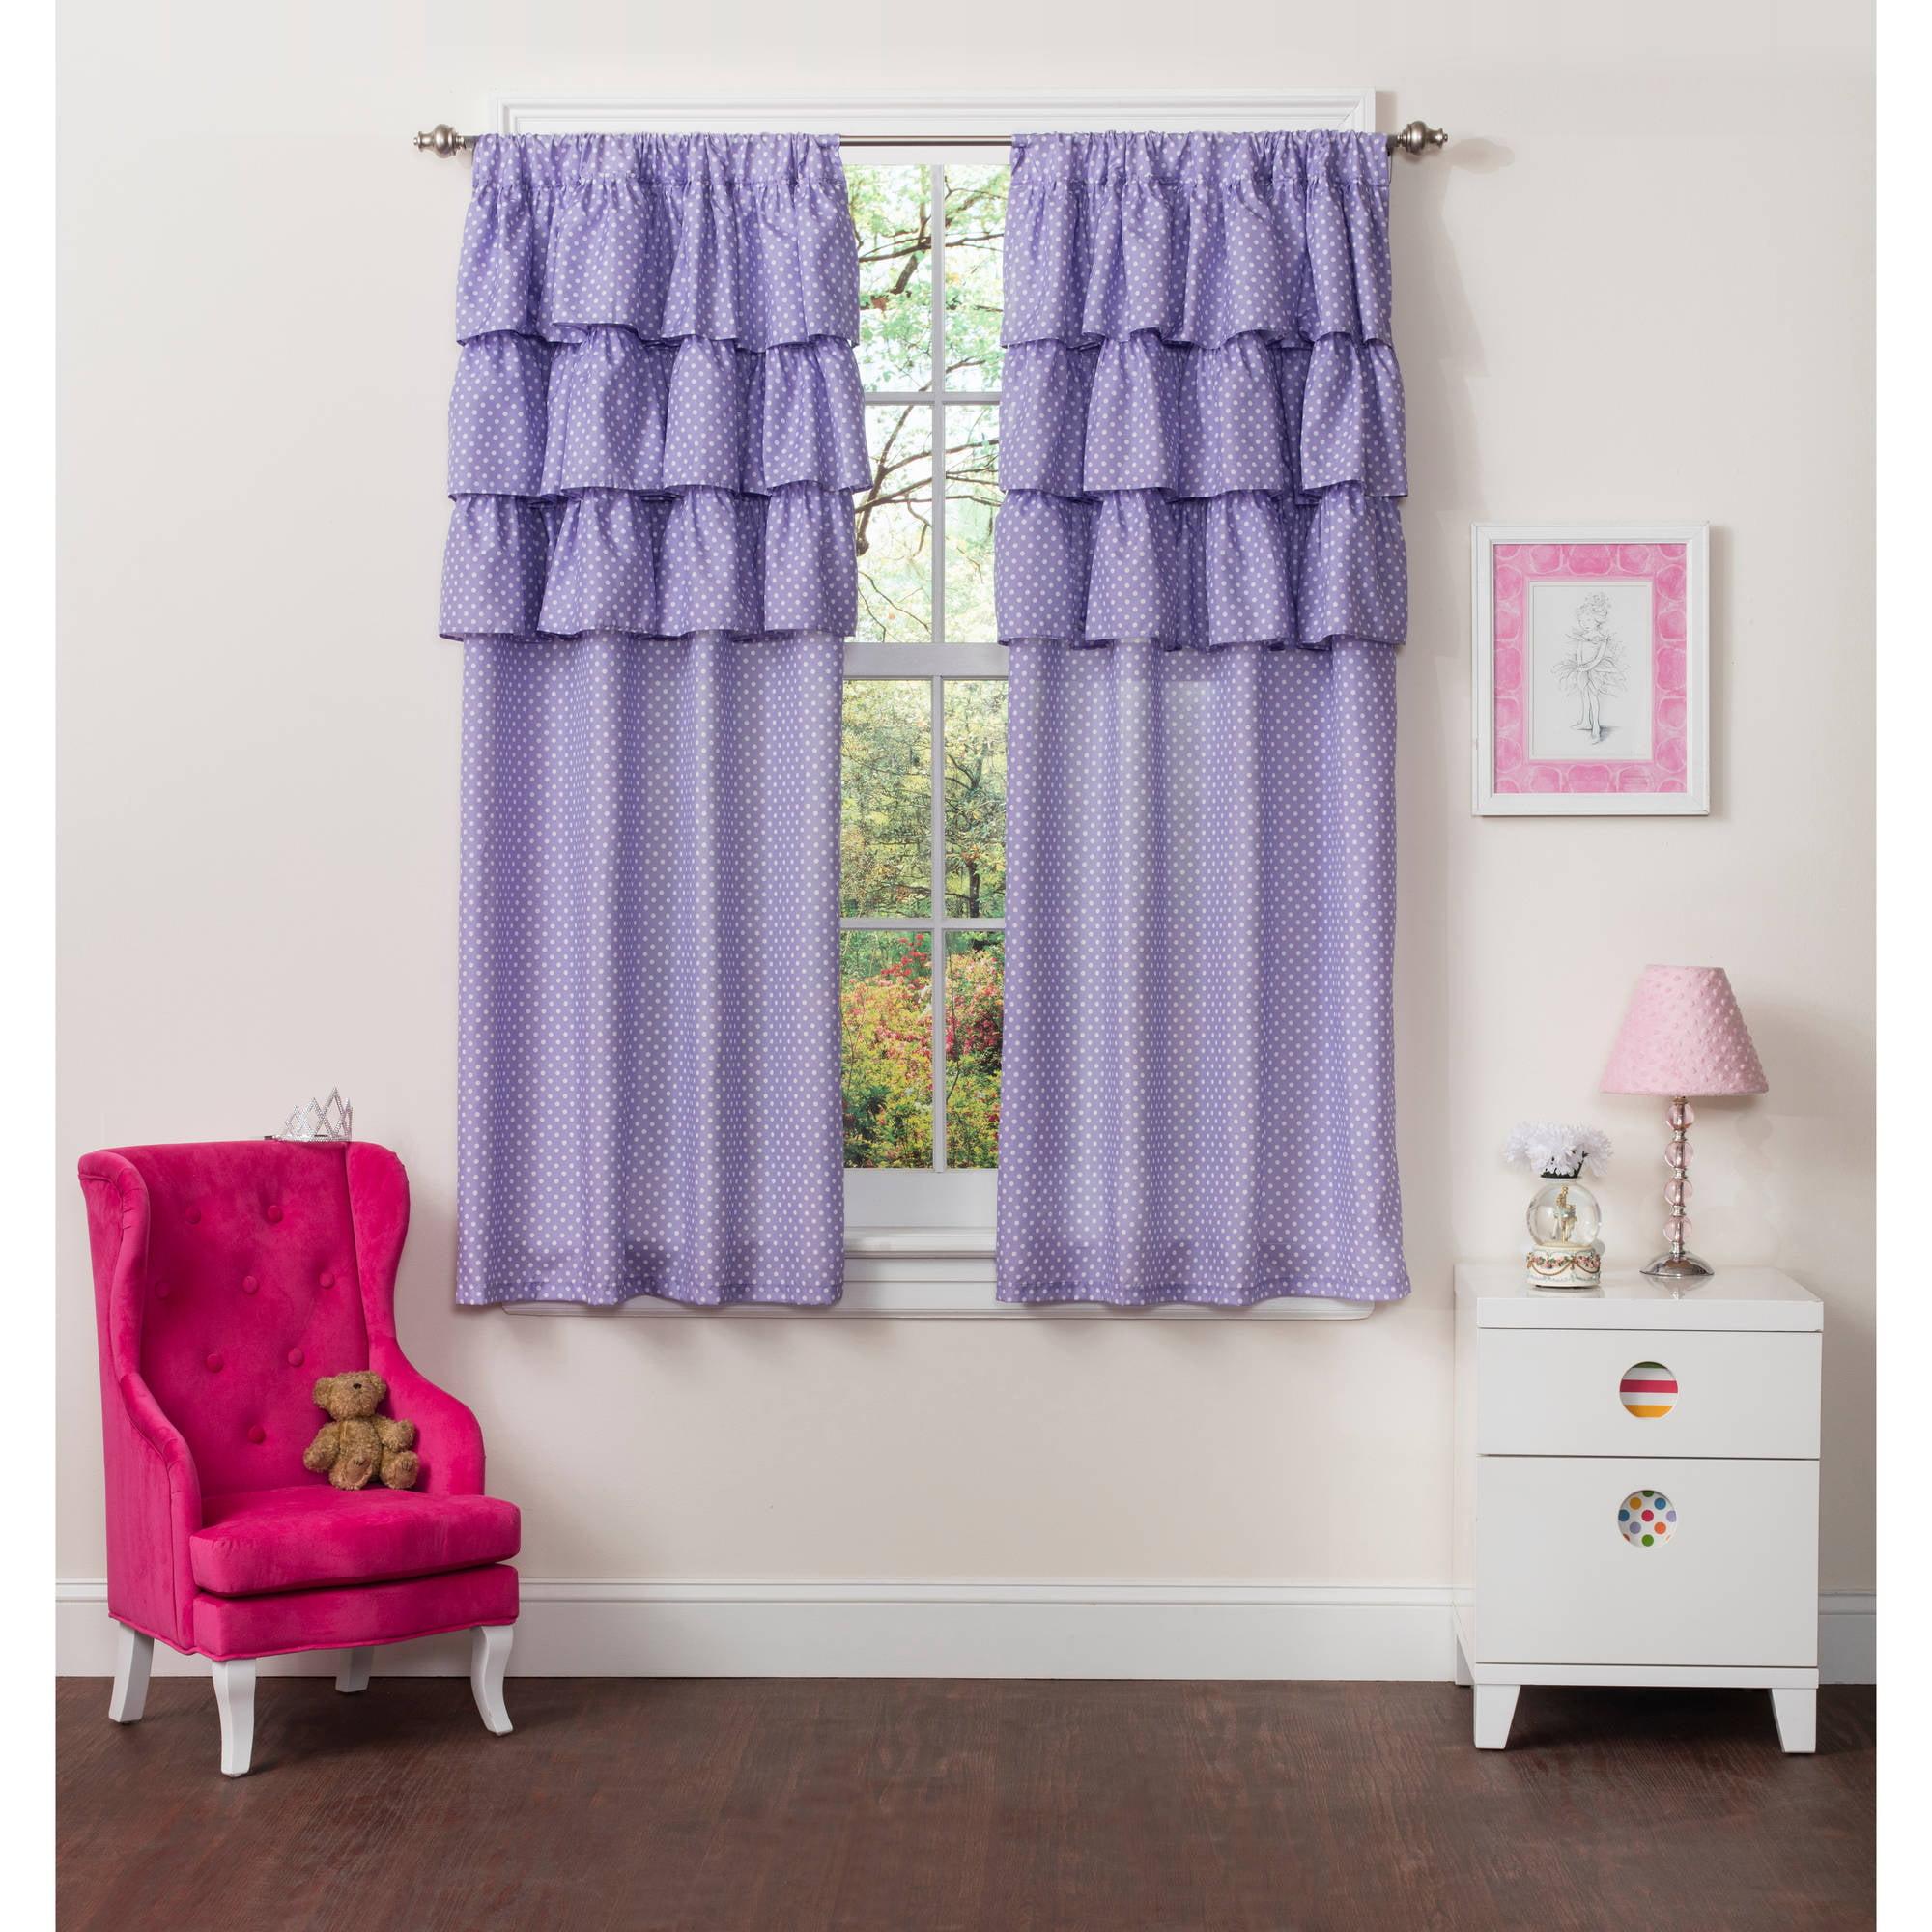 Lilac Bedroom Curtains Eclipse Dayton Blackout Energy Efficient Kids Bedroom Curtain